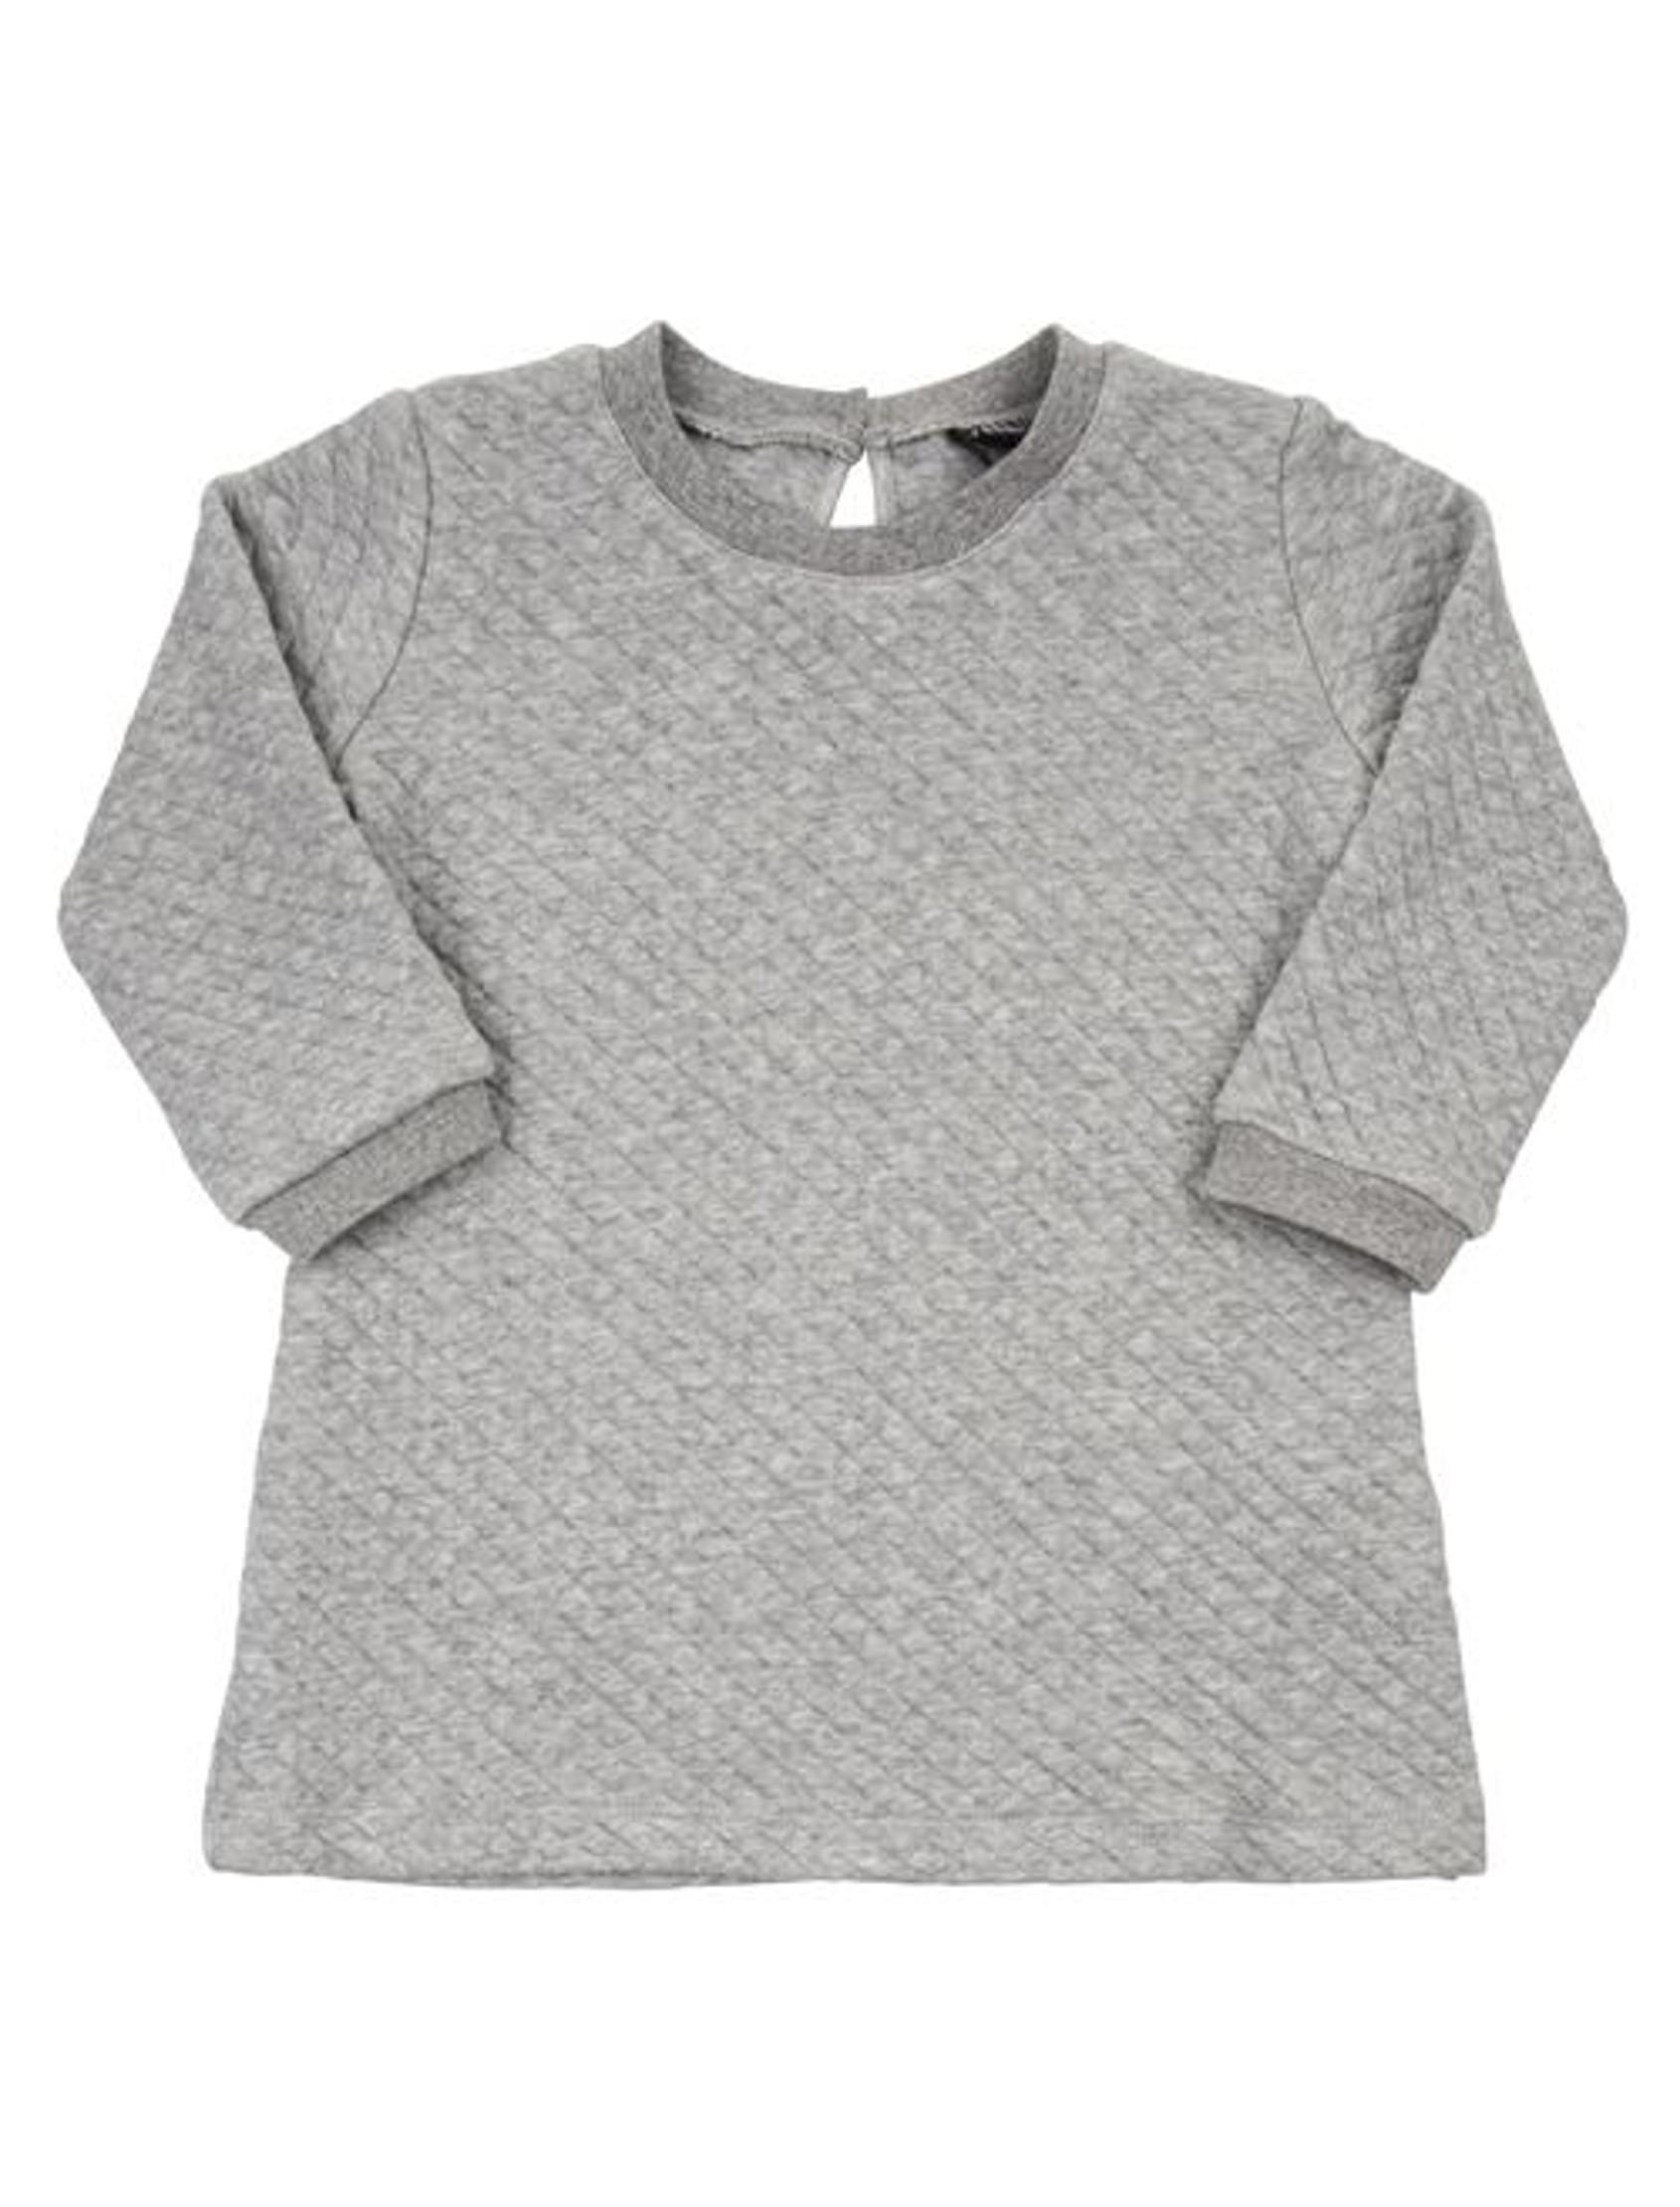 Vestido gris Carlijnq_01